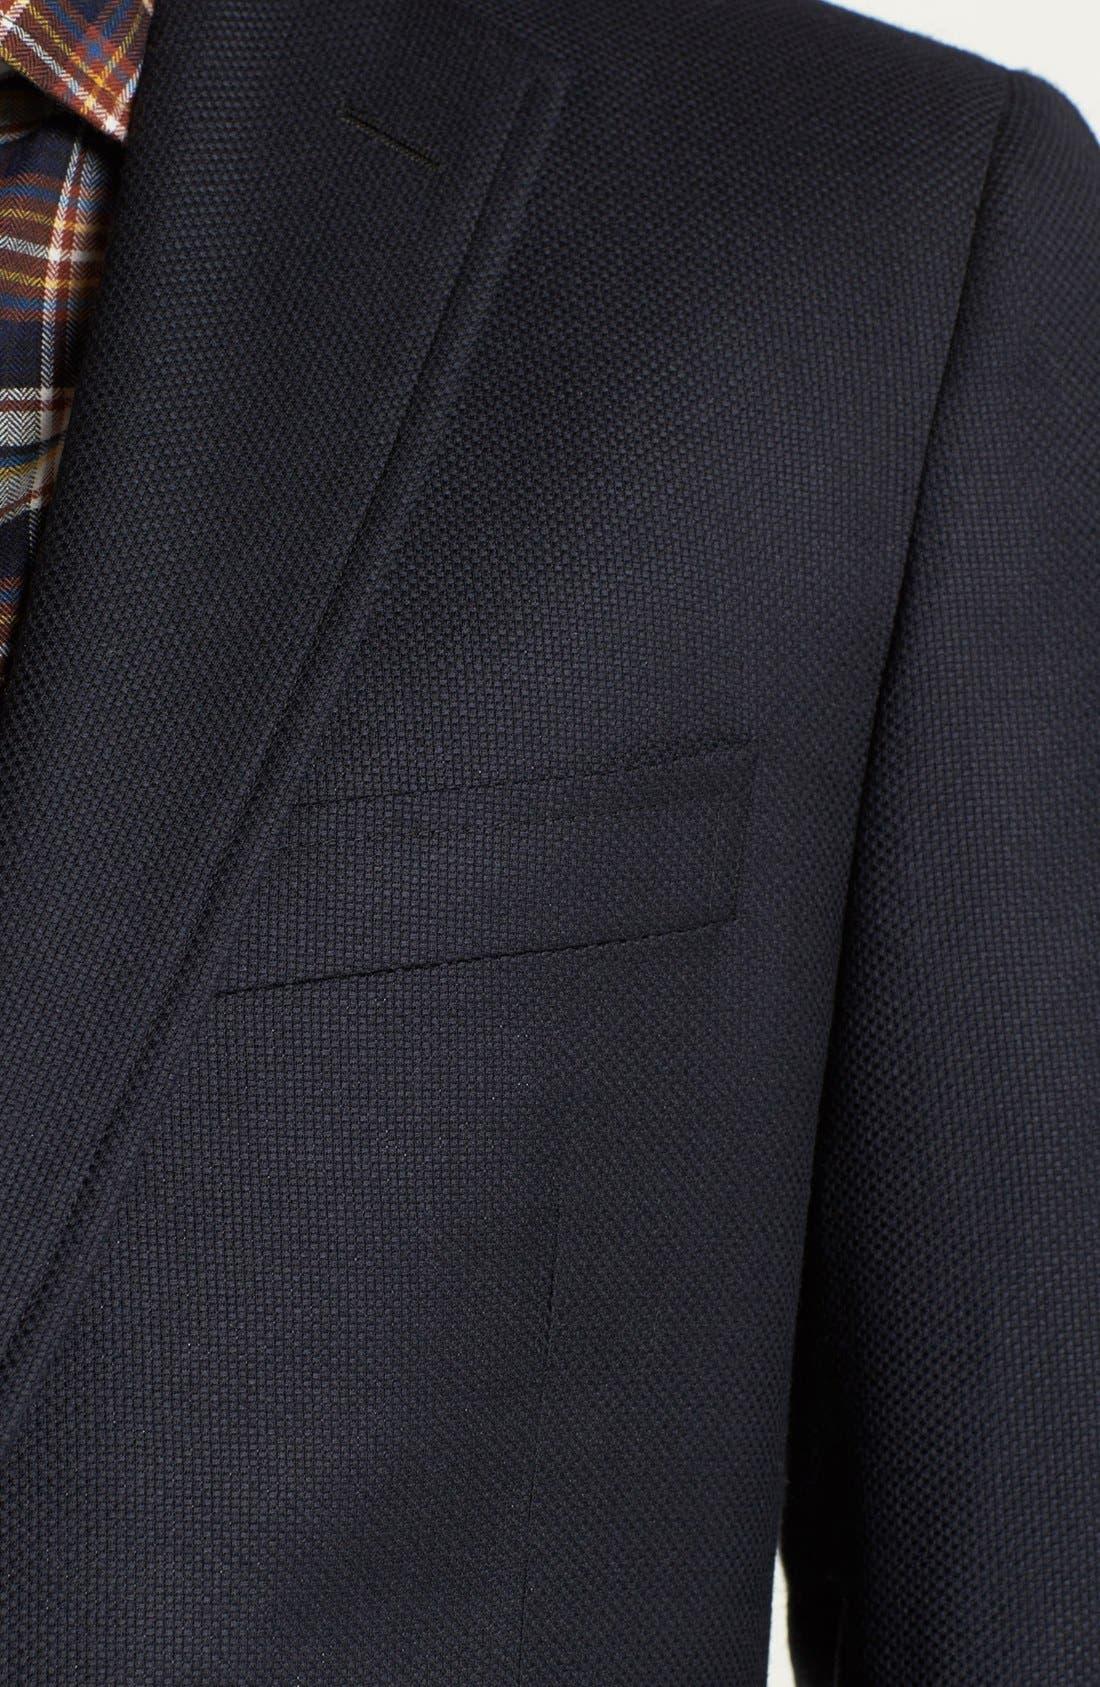 Alternate Image 2  - Billy Reid 'Campbell' Wool Sportcoat